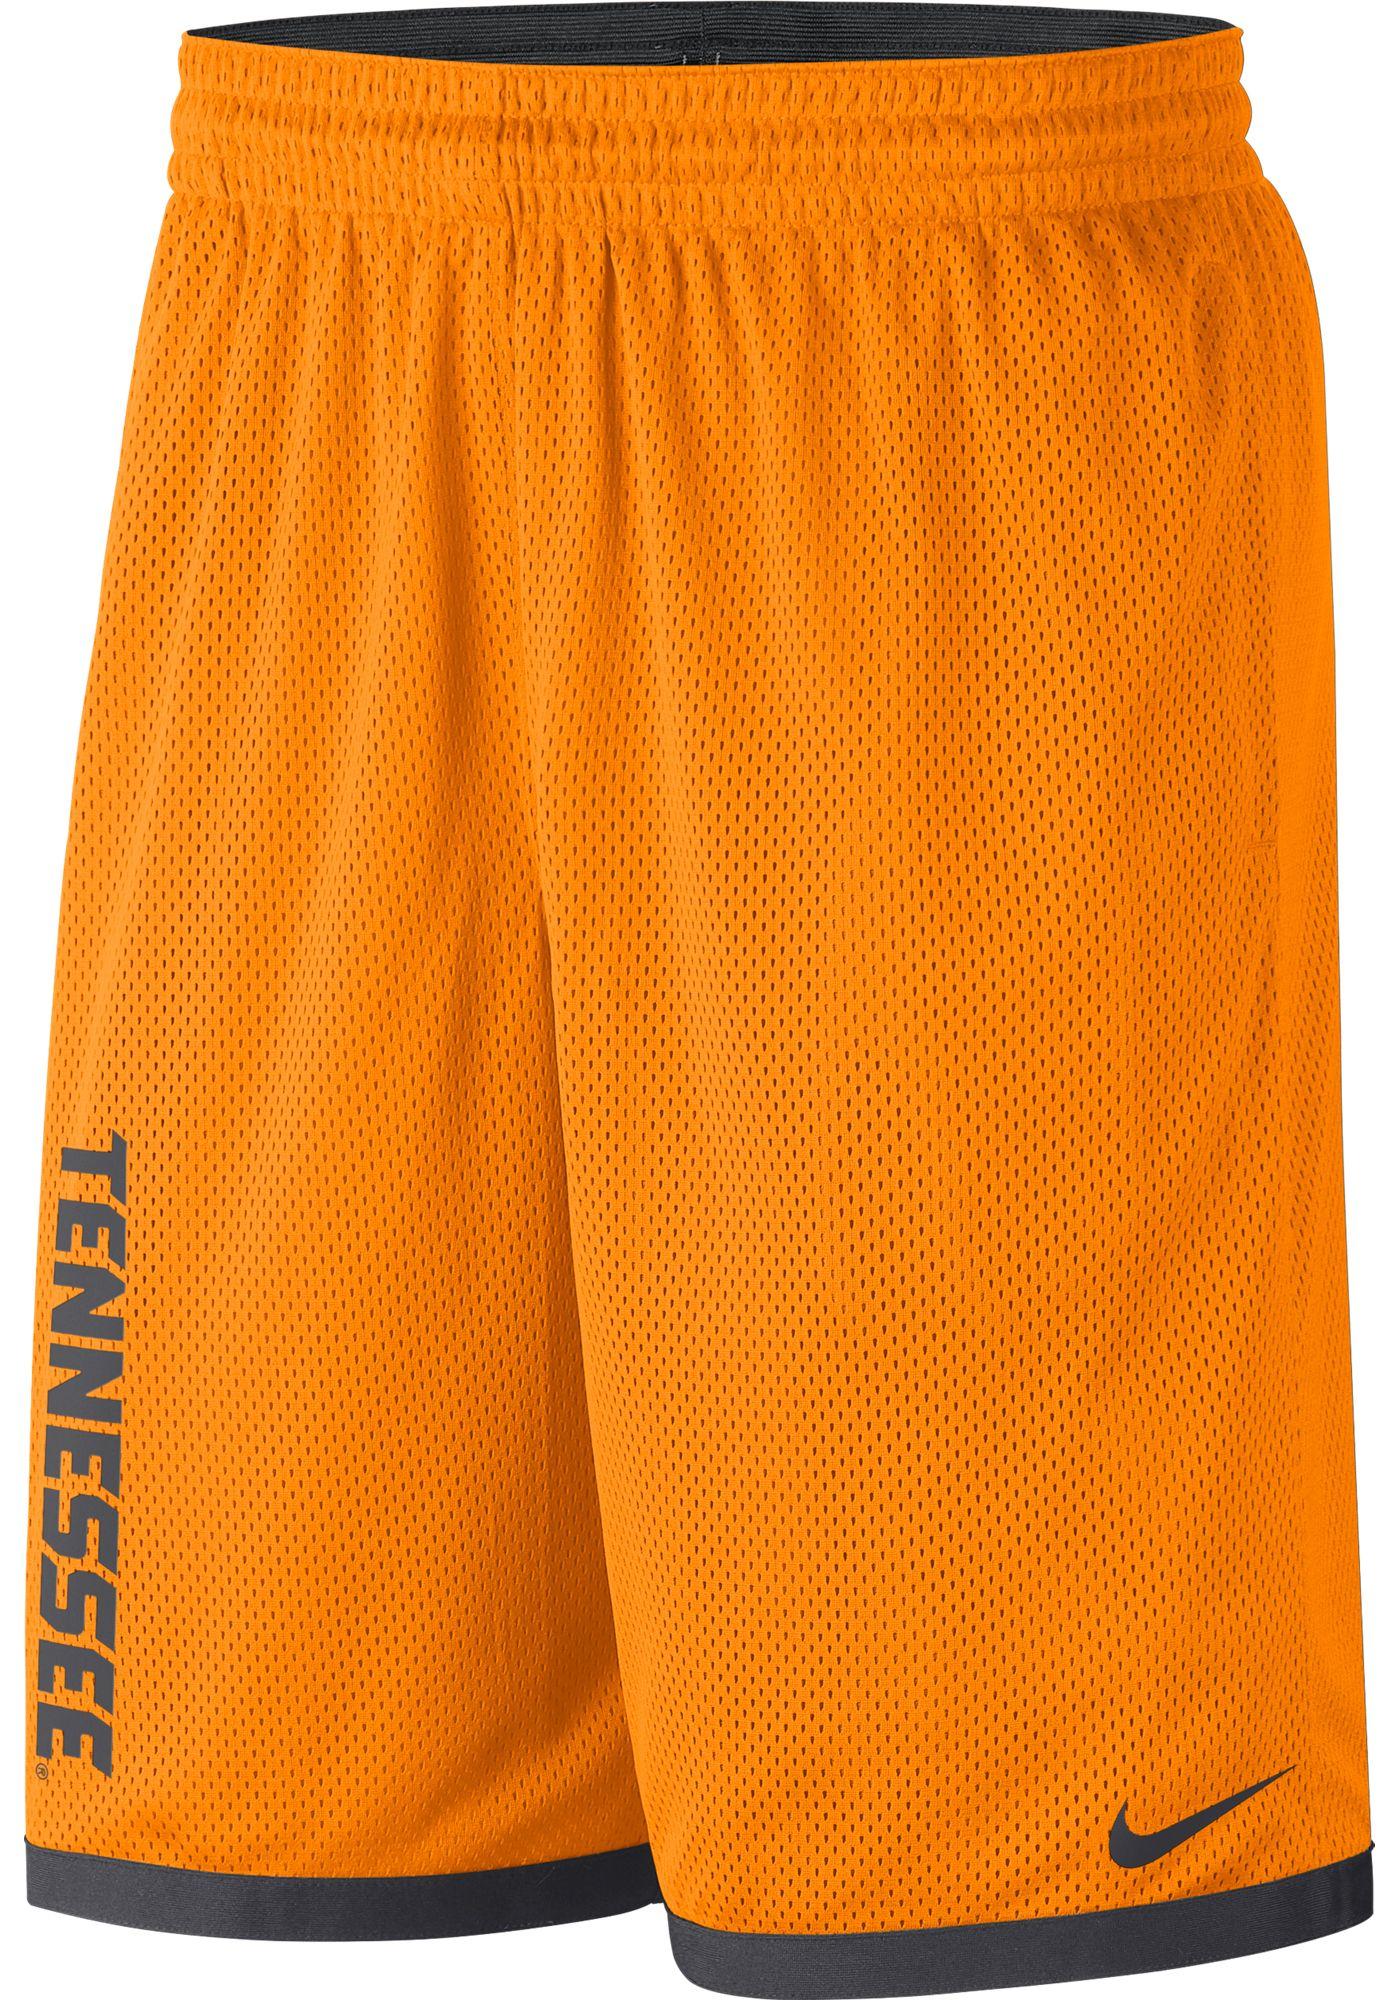 Nike Men's Tennessee Volunteers Tennessee Orange Dri-FIT Mesh Basketball Shorts